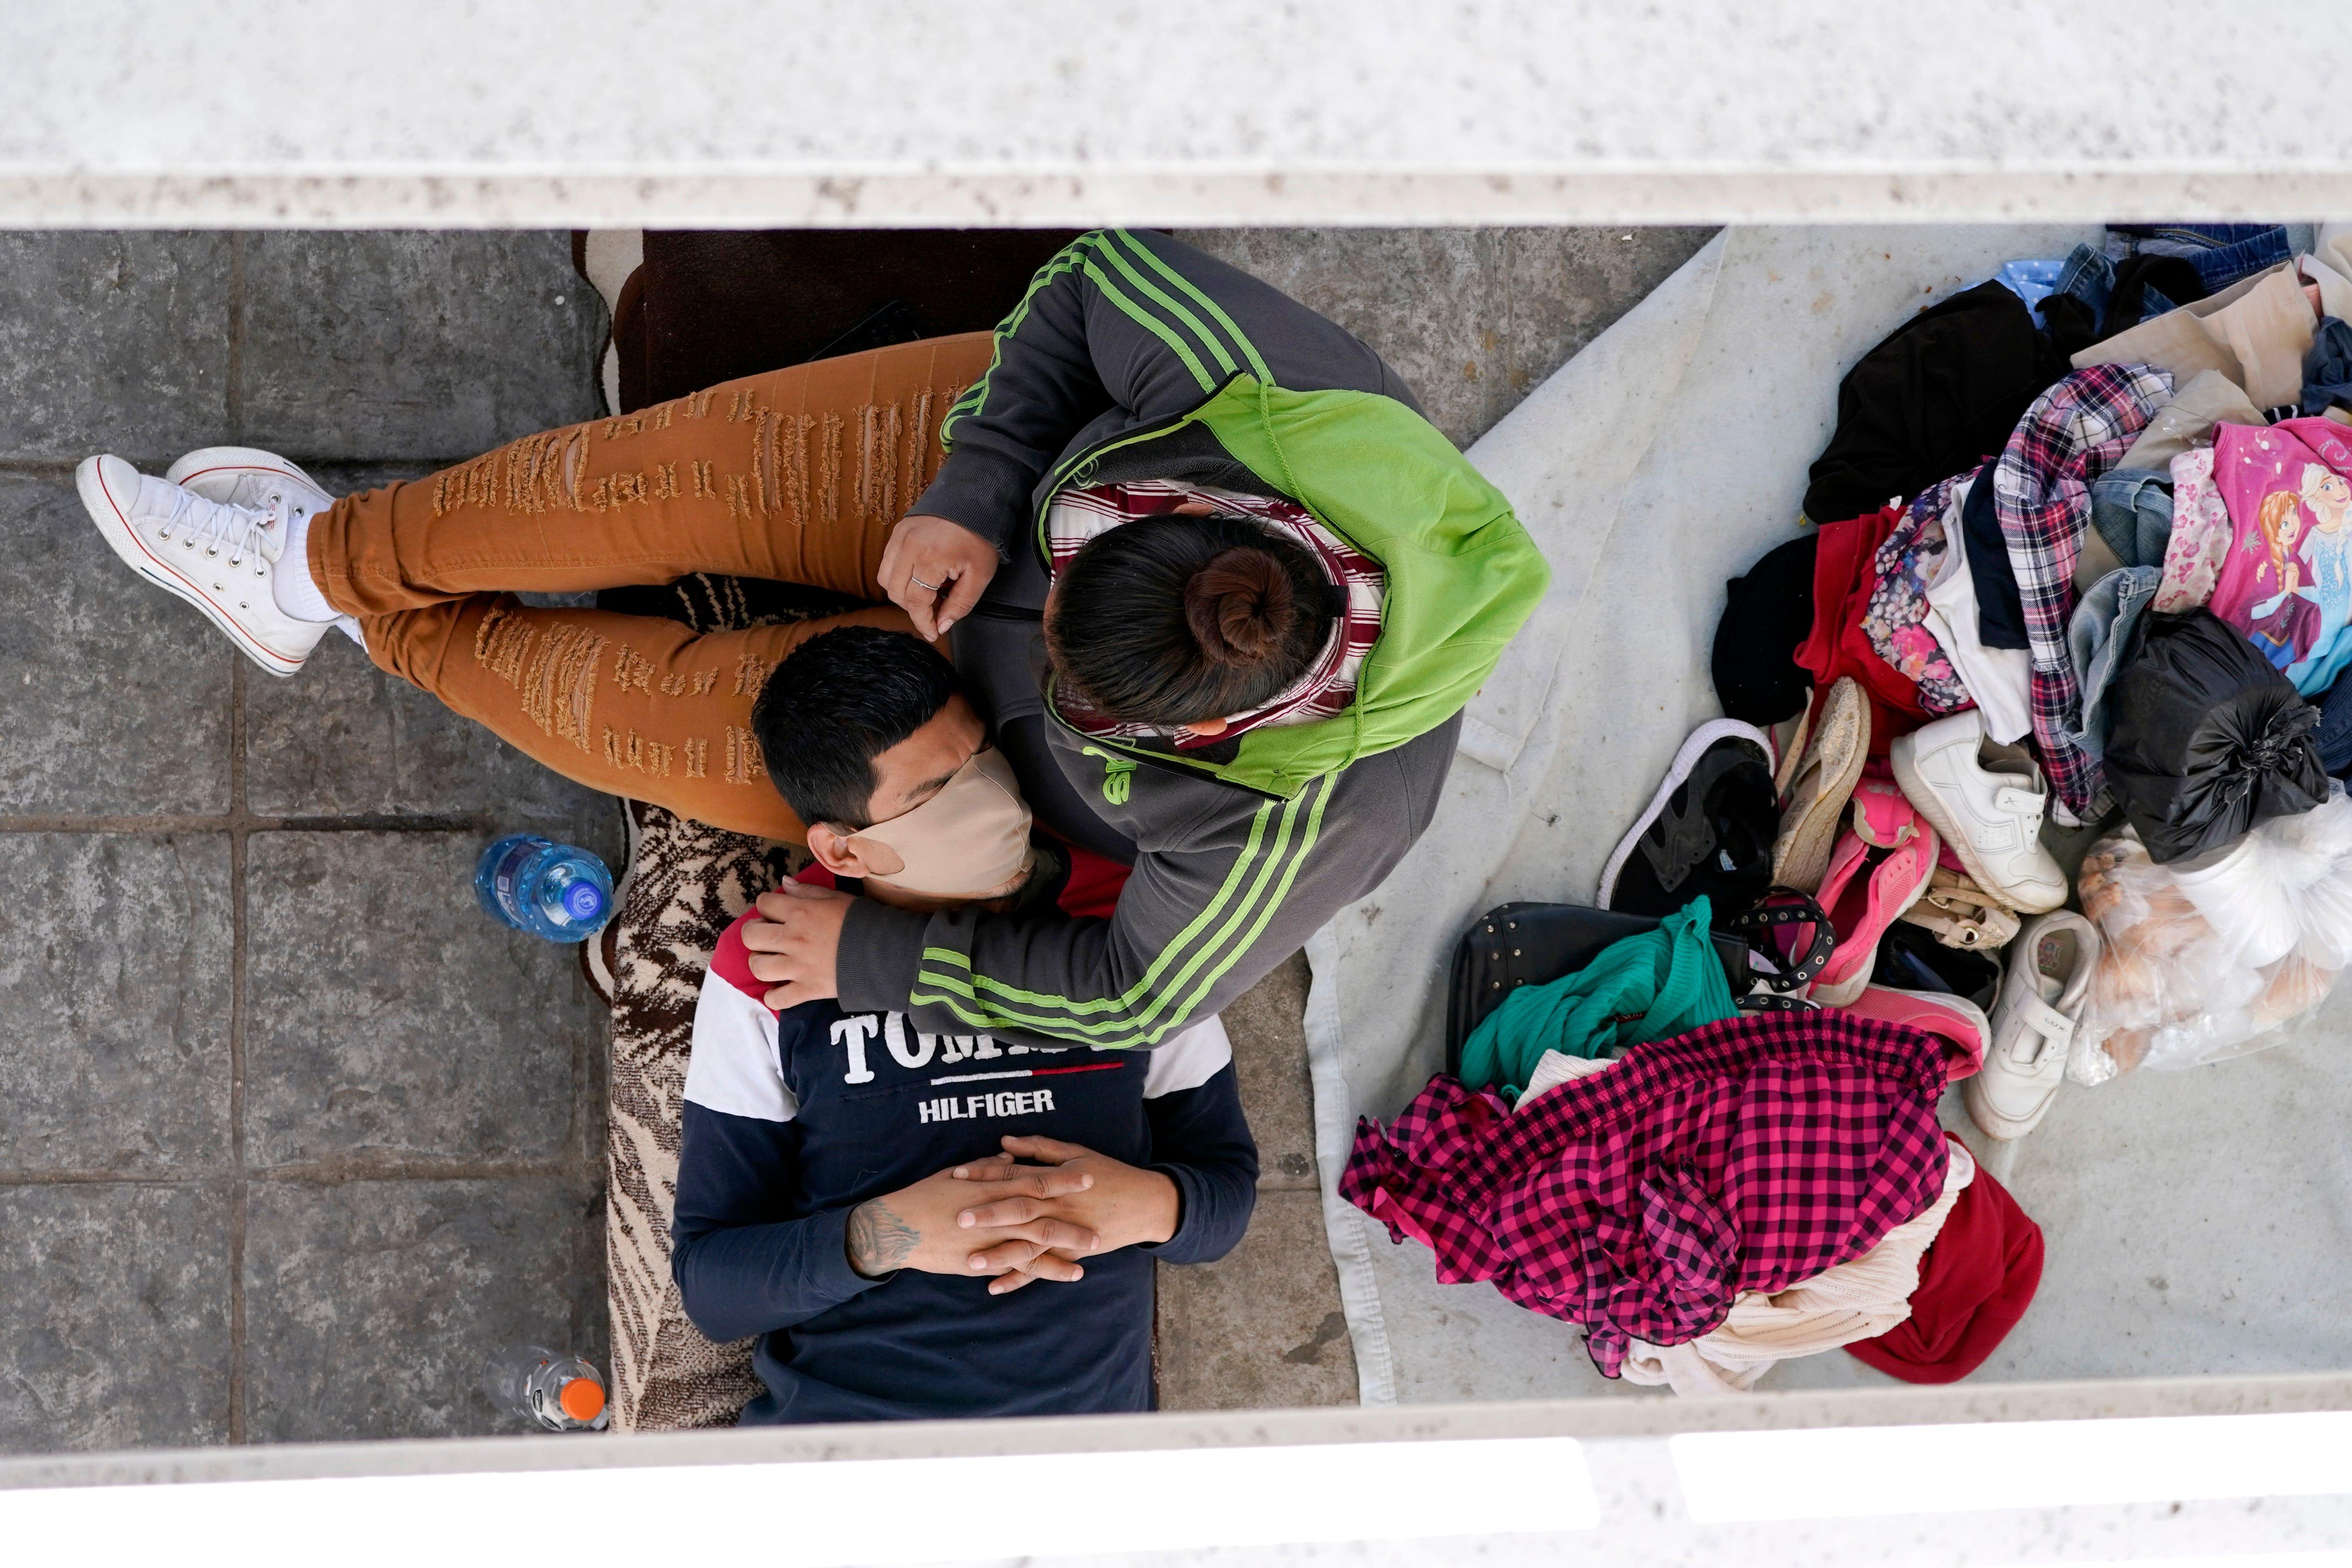 Emergency sites for migrant children raising safety concerns 2